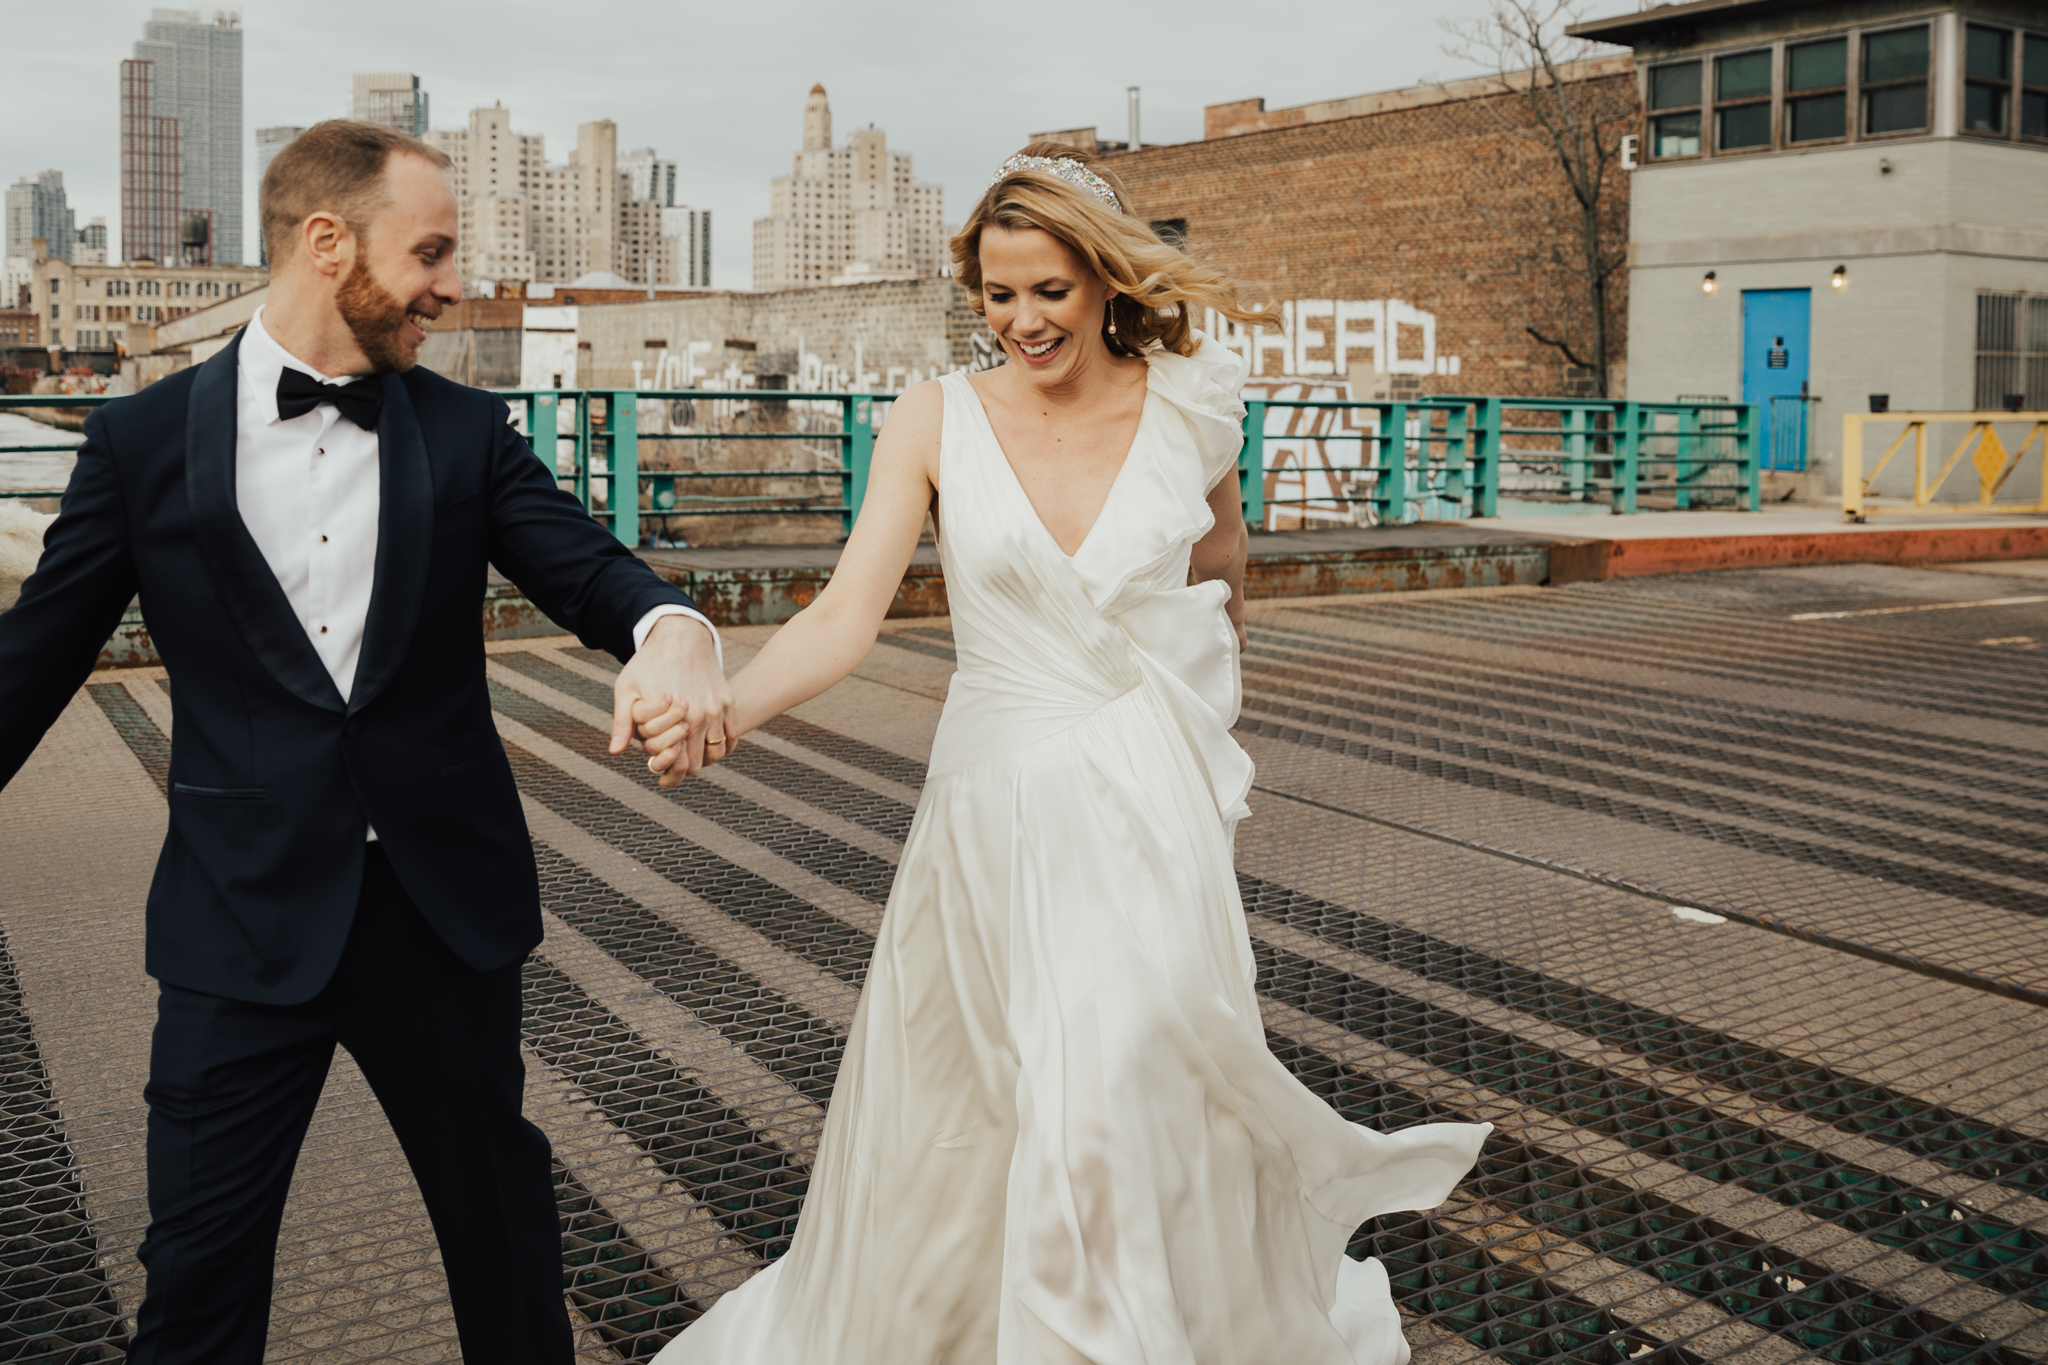 Melissa + Zach - The Green Building Wedding